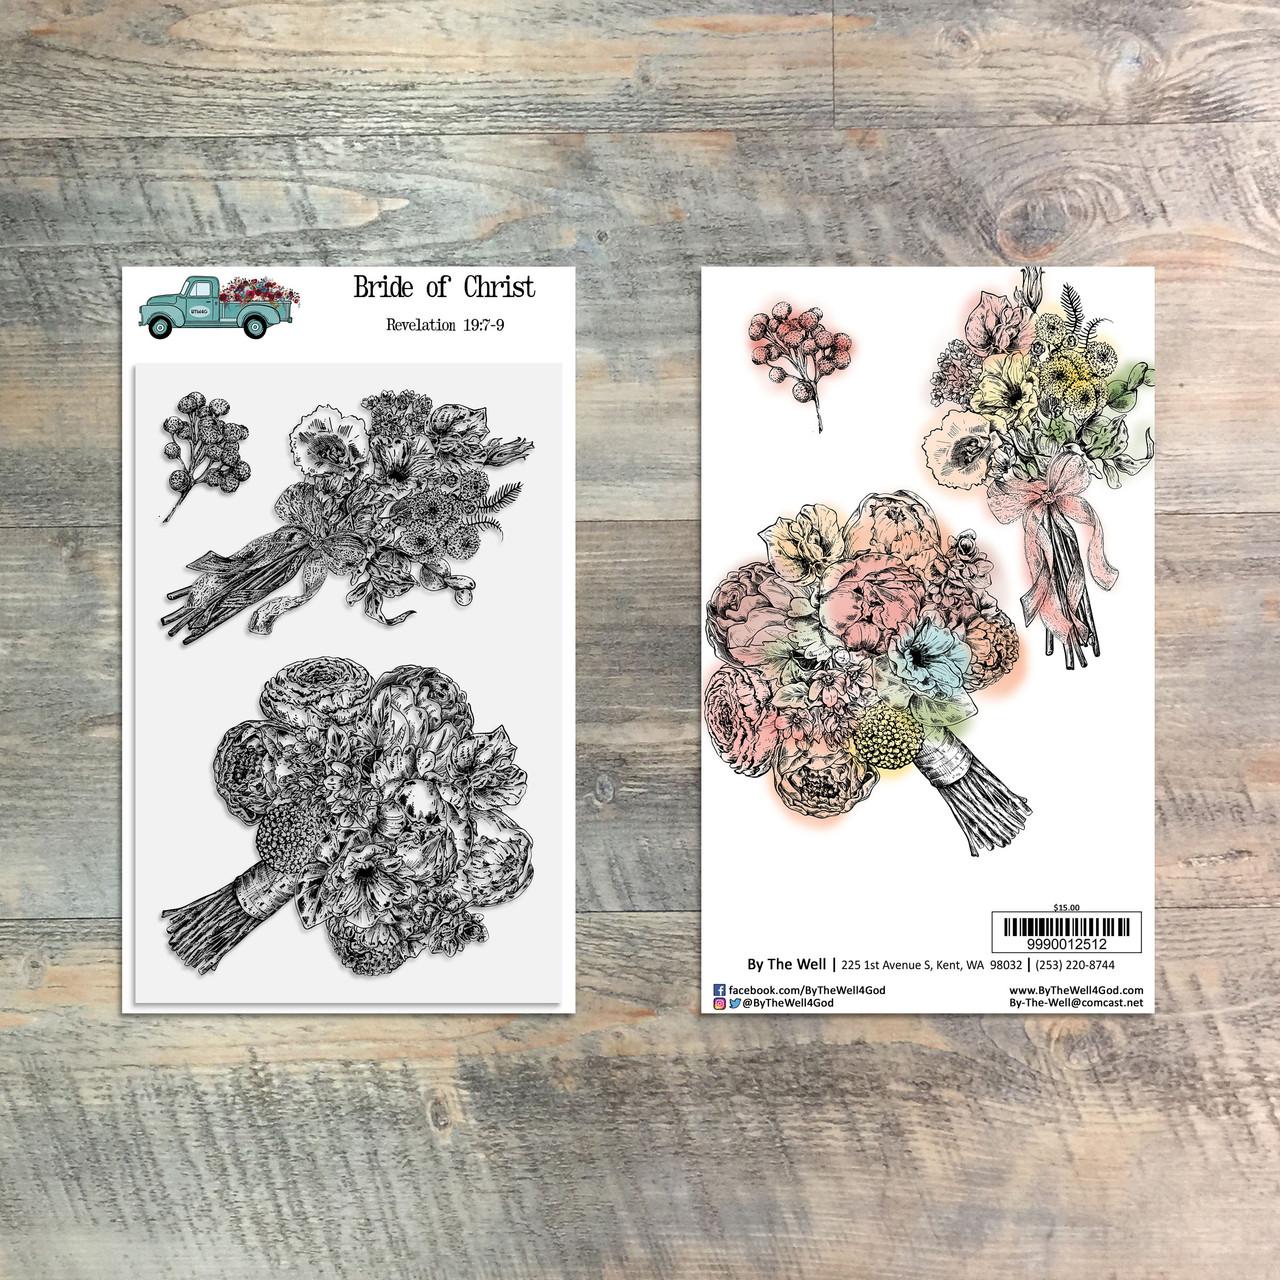 Bride of Christ - 3 Piece 4x6 Stamp Set